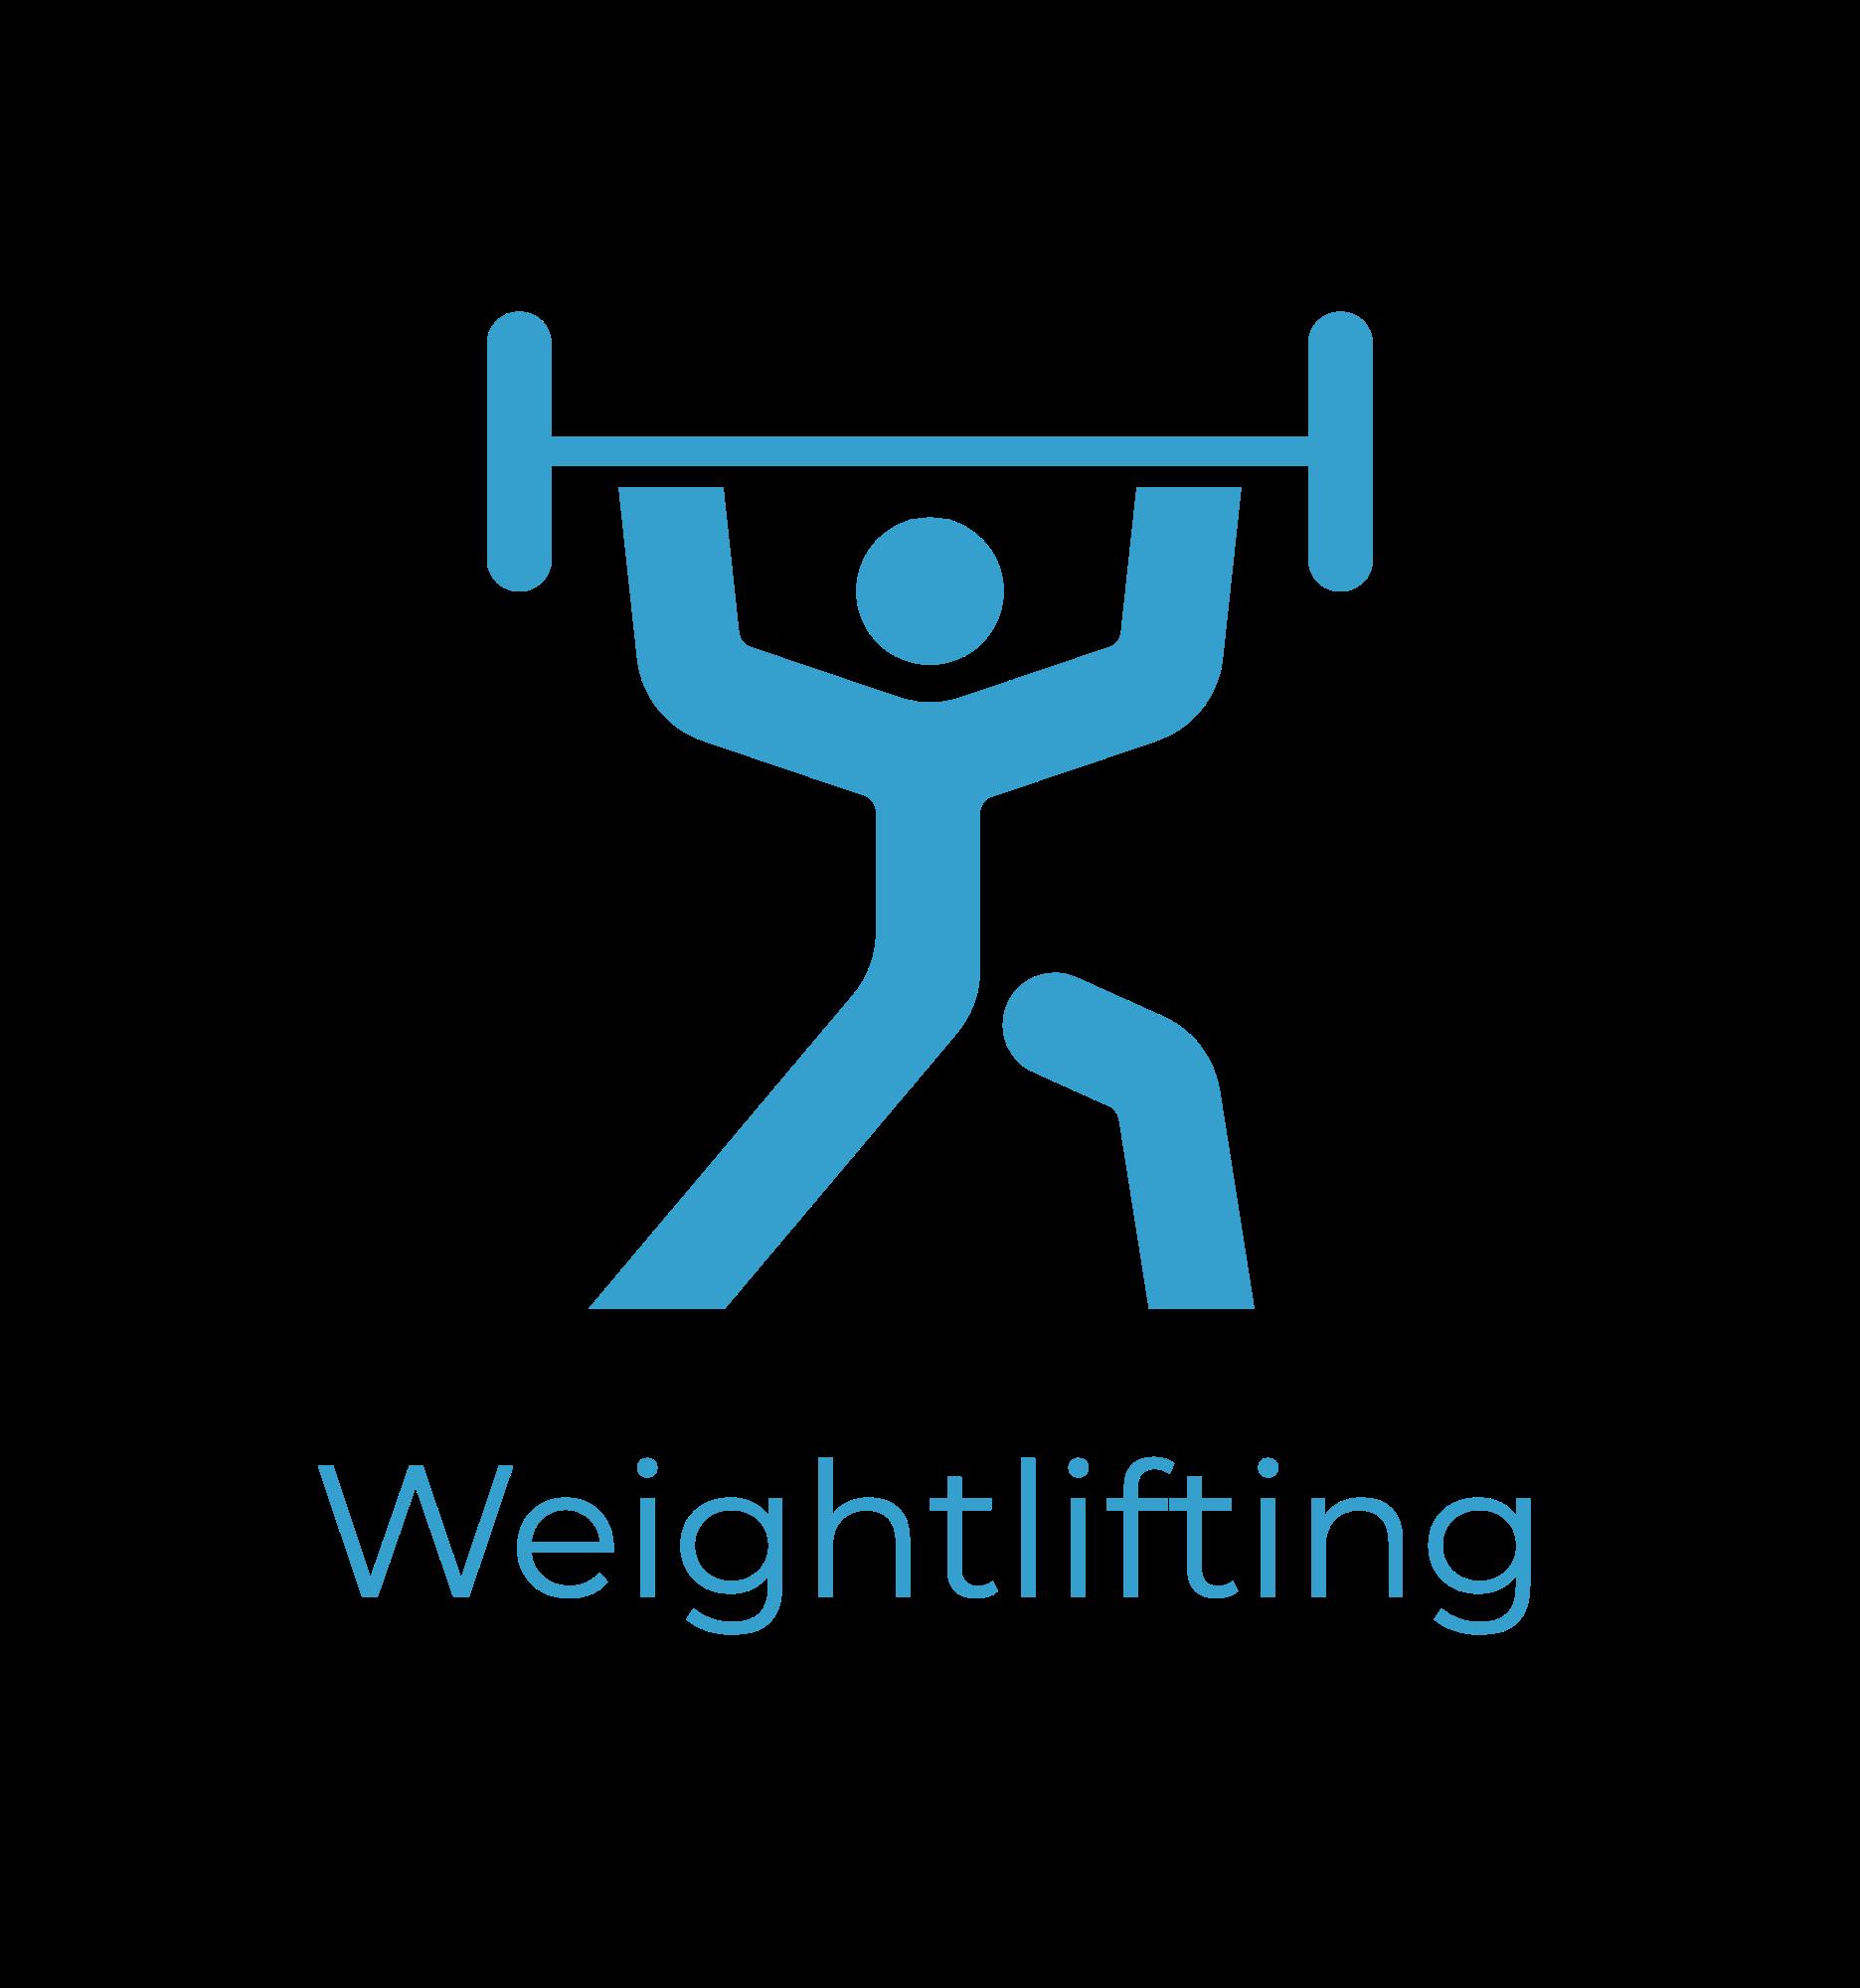 weightlifting logo.png